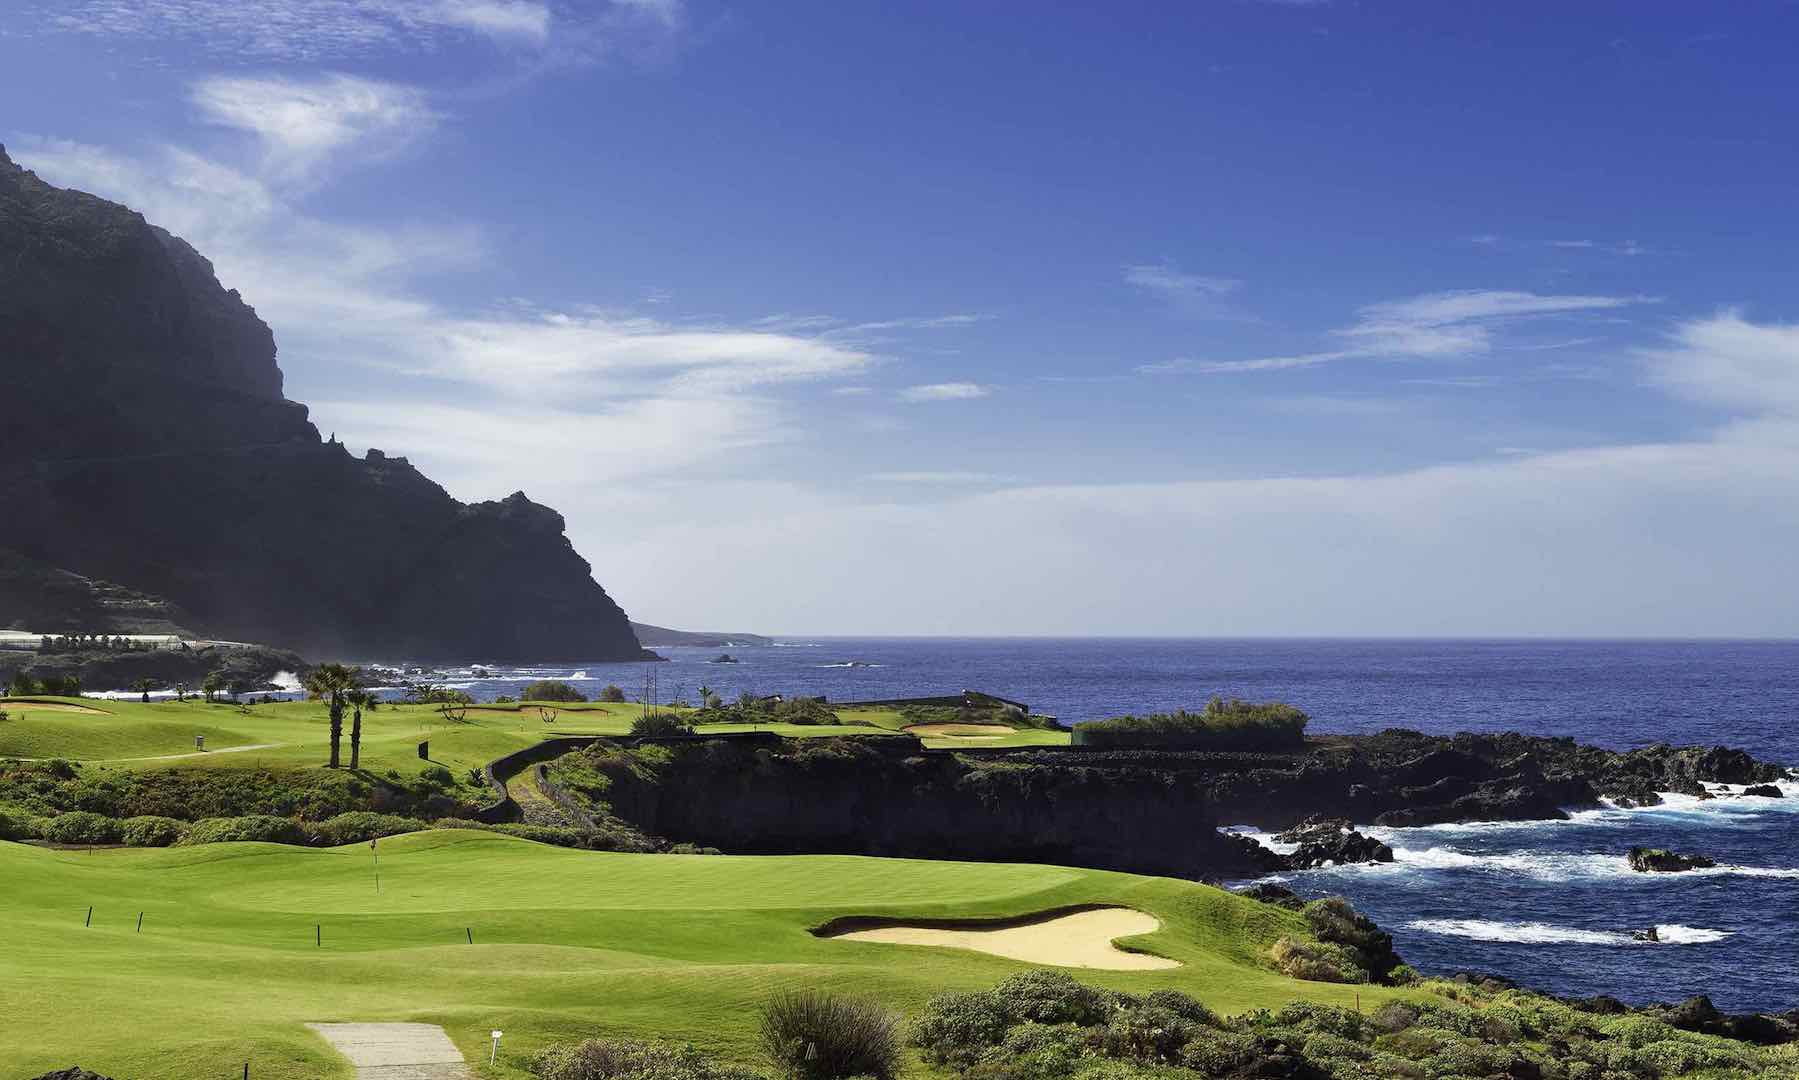 Buenavista Golf aiming high